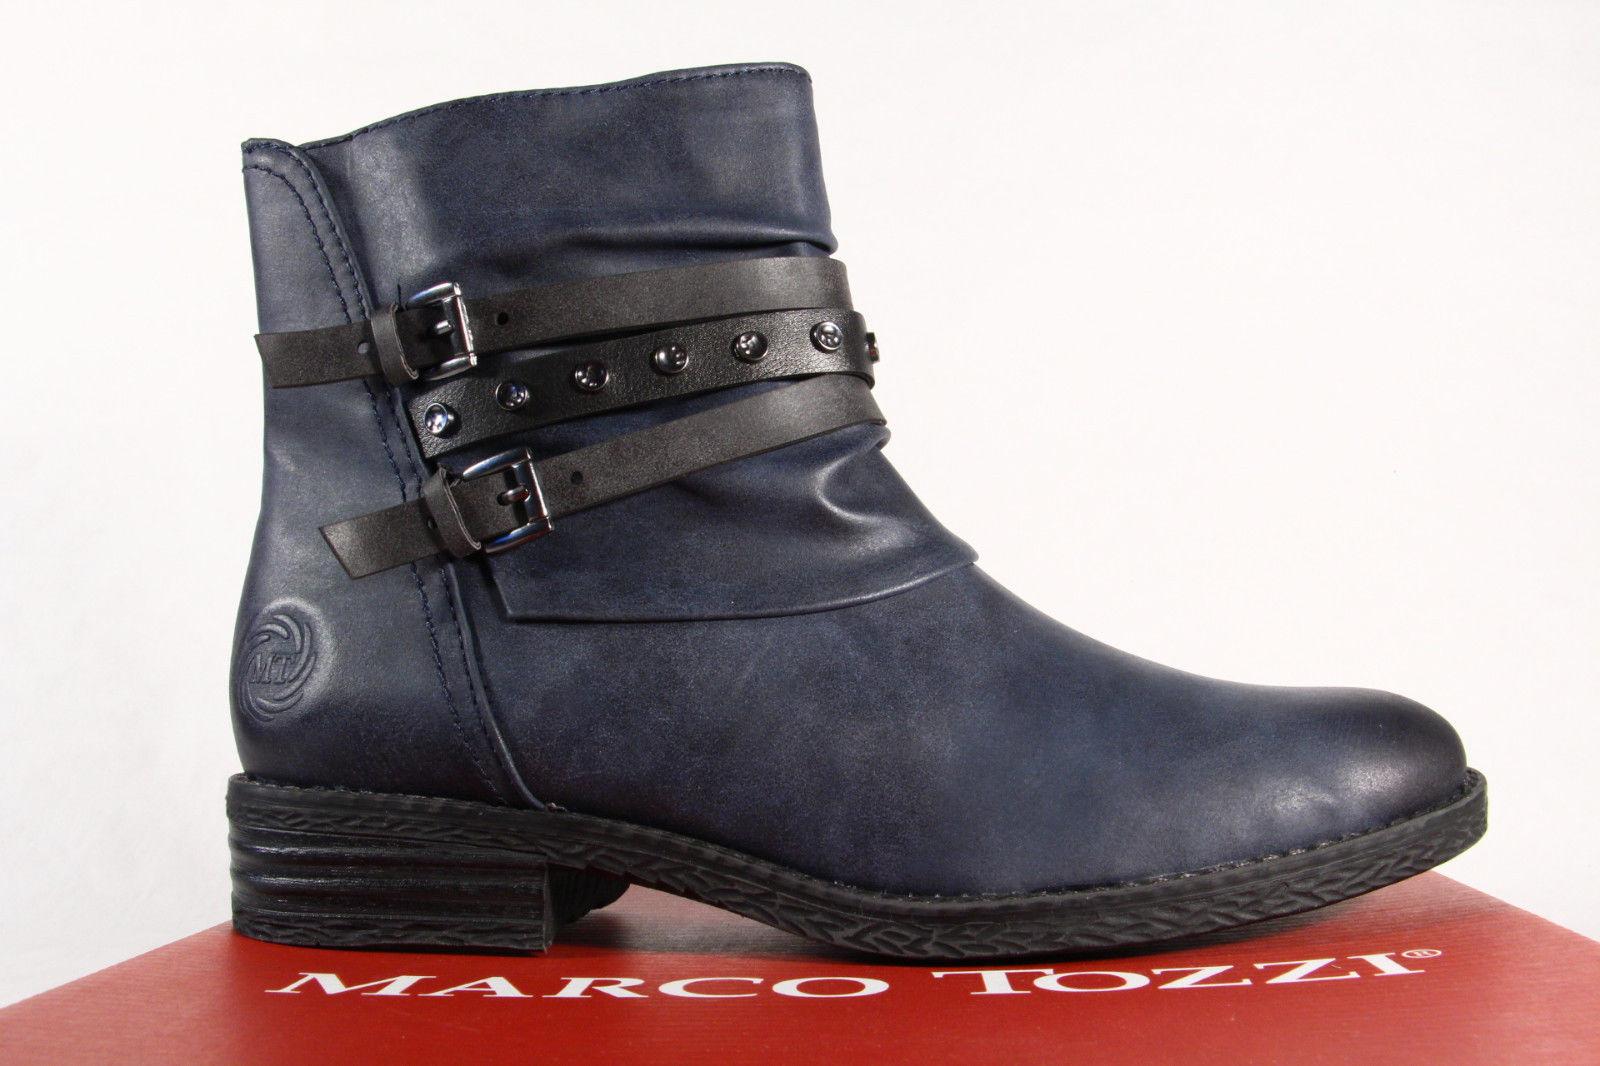 Marco Tozzi Damen 25413 Stiefel Stiefeletten Schnürstiefel, Stiefel navy blau 25413 Damen NEU  45b589